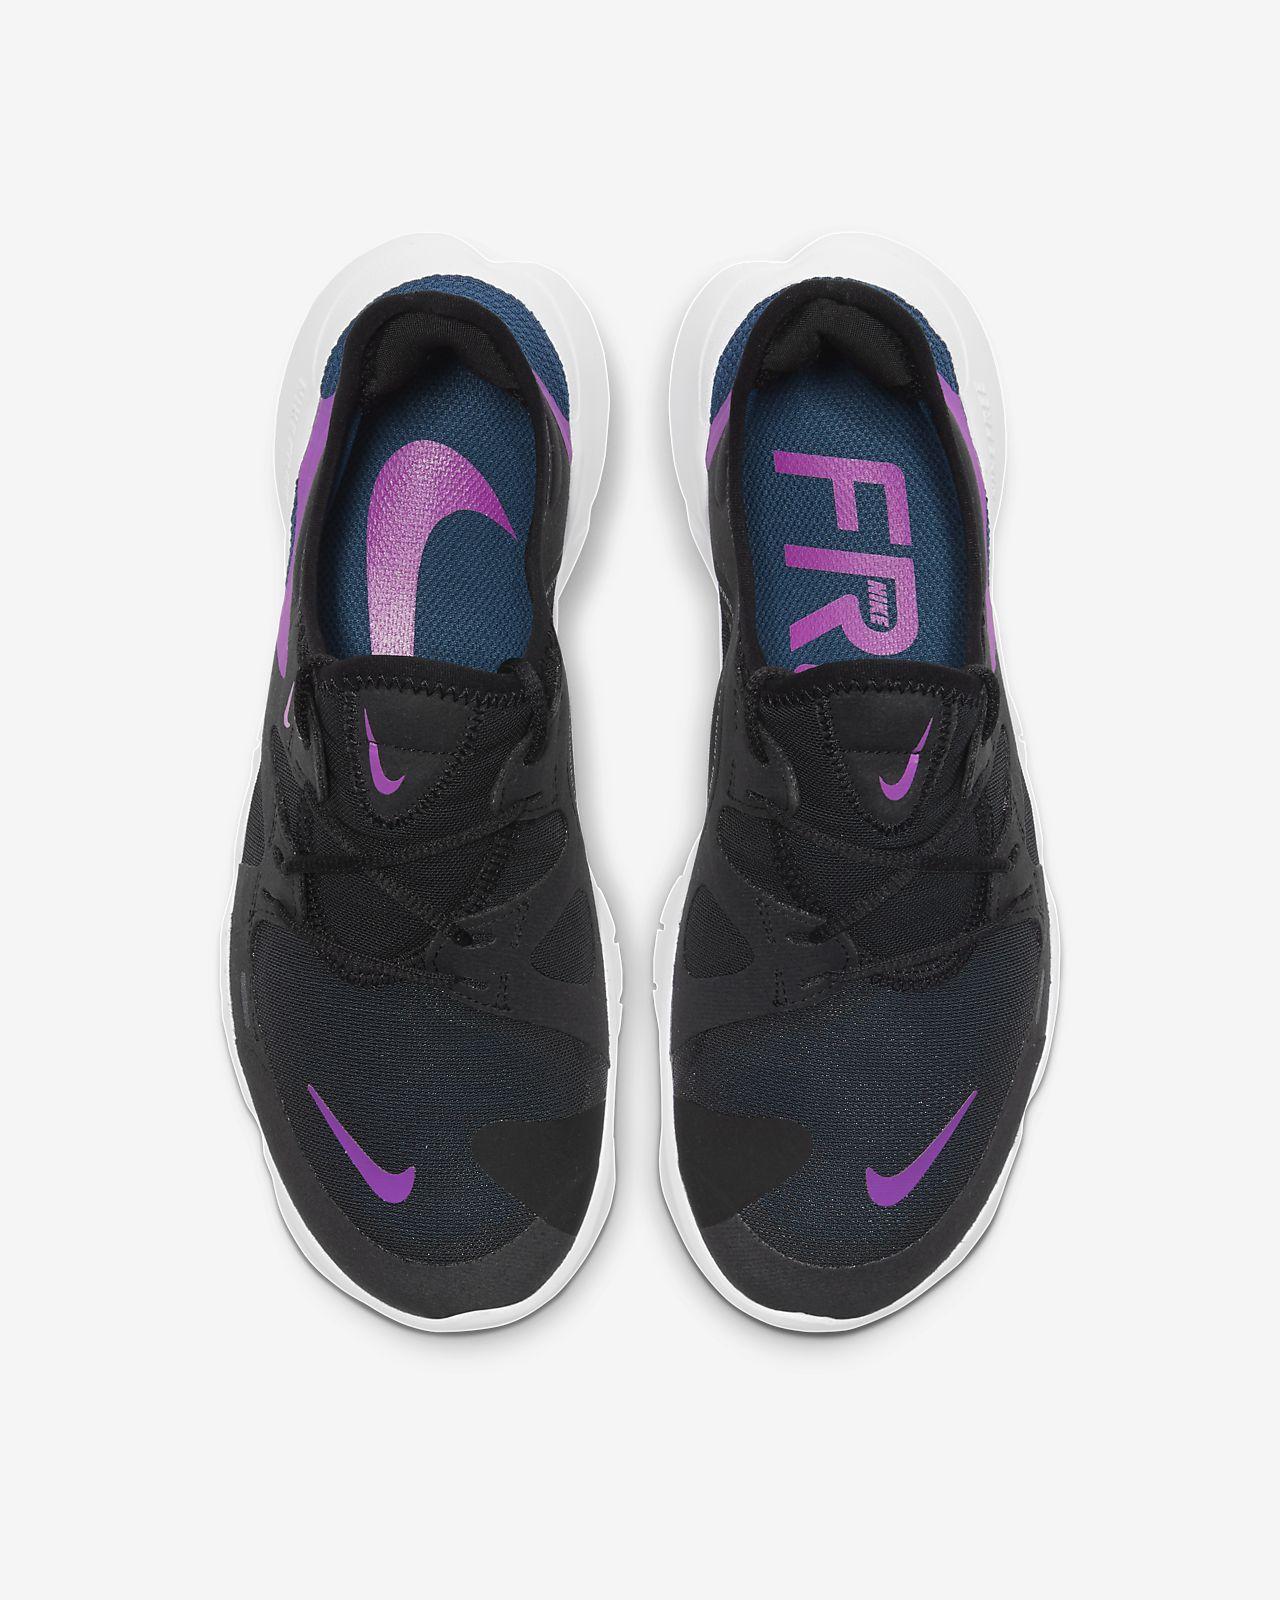 nike free nikefree, Chaussure Nike Free Run 5.0 Homme